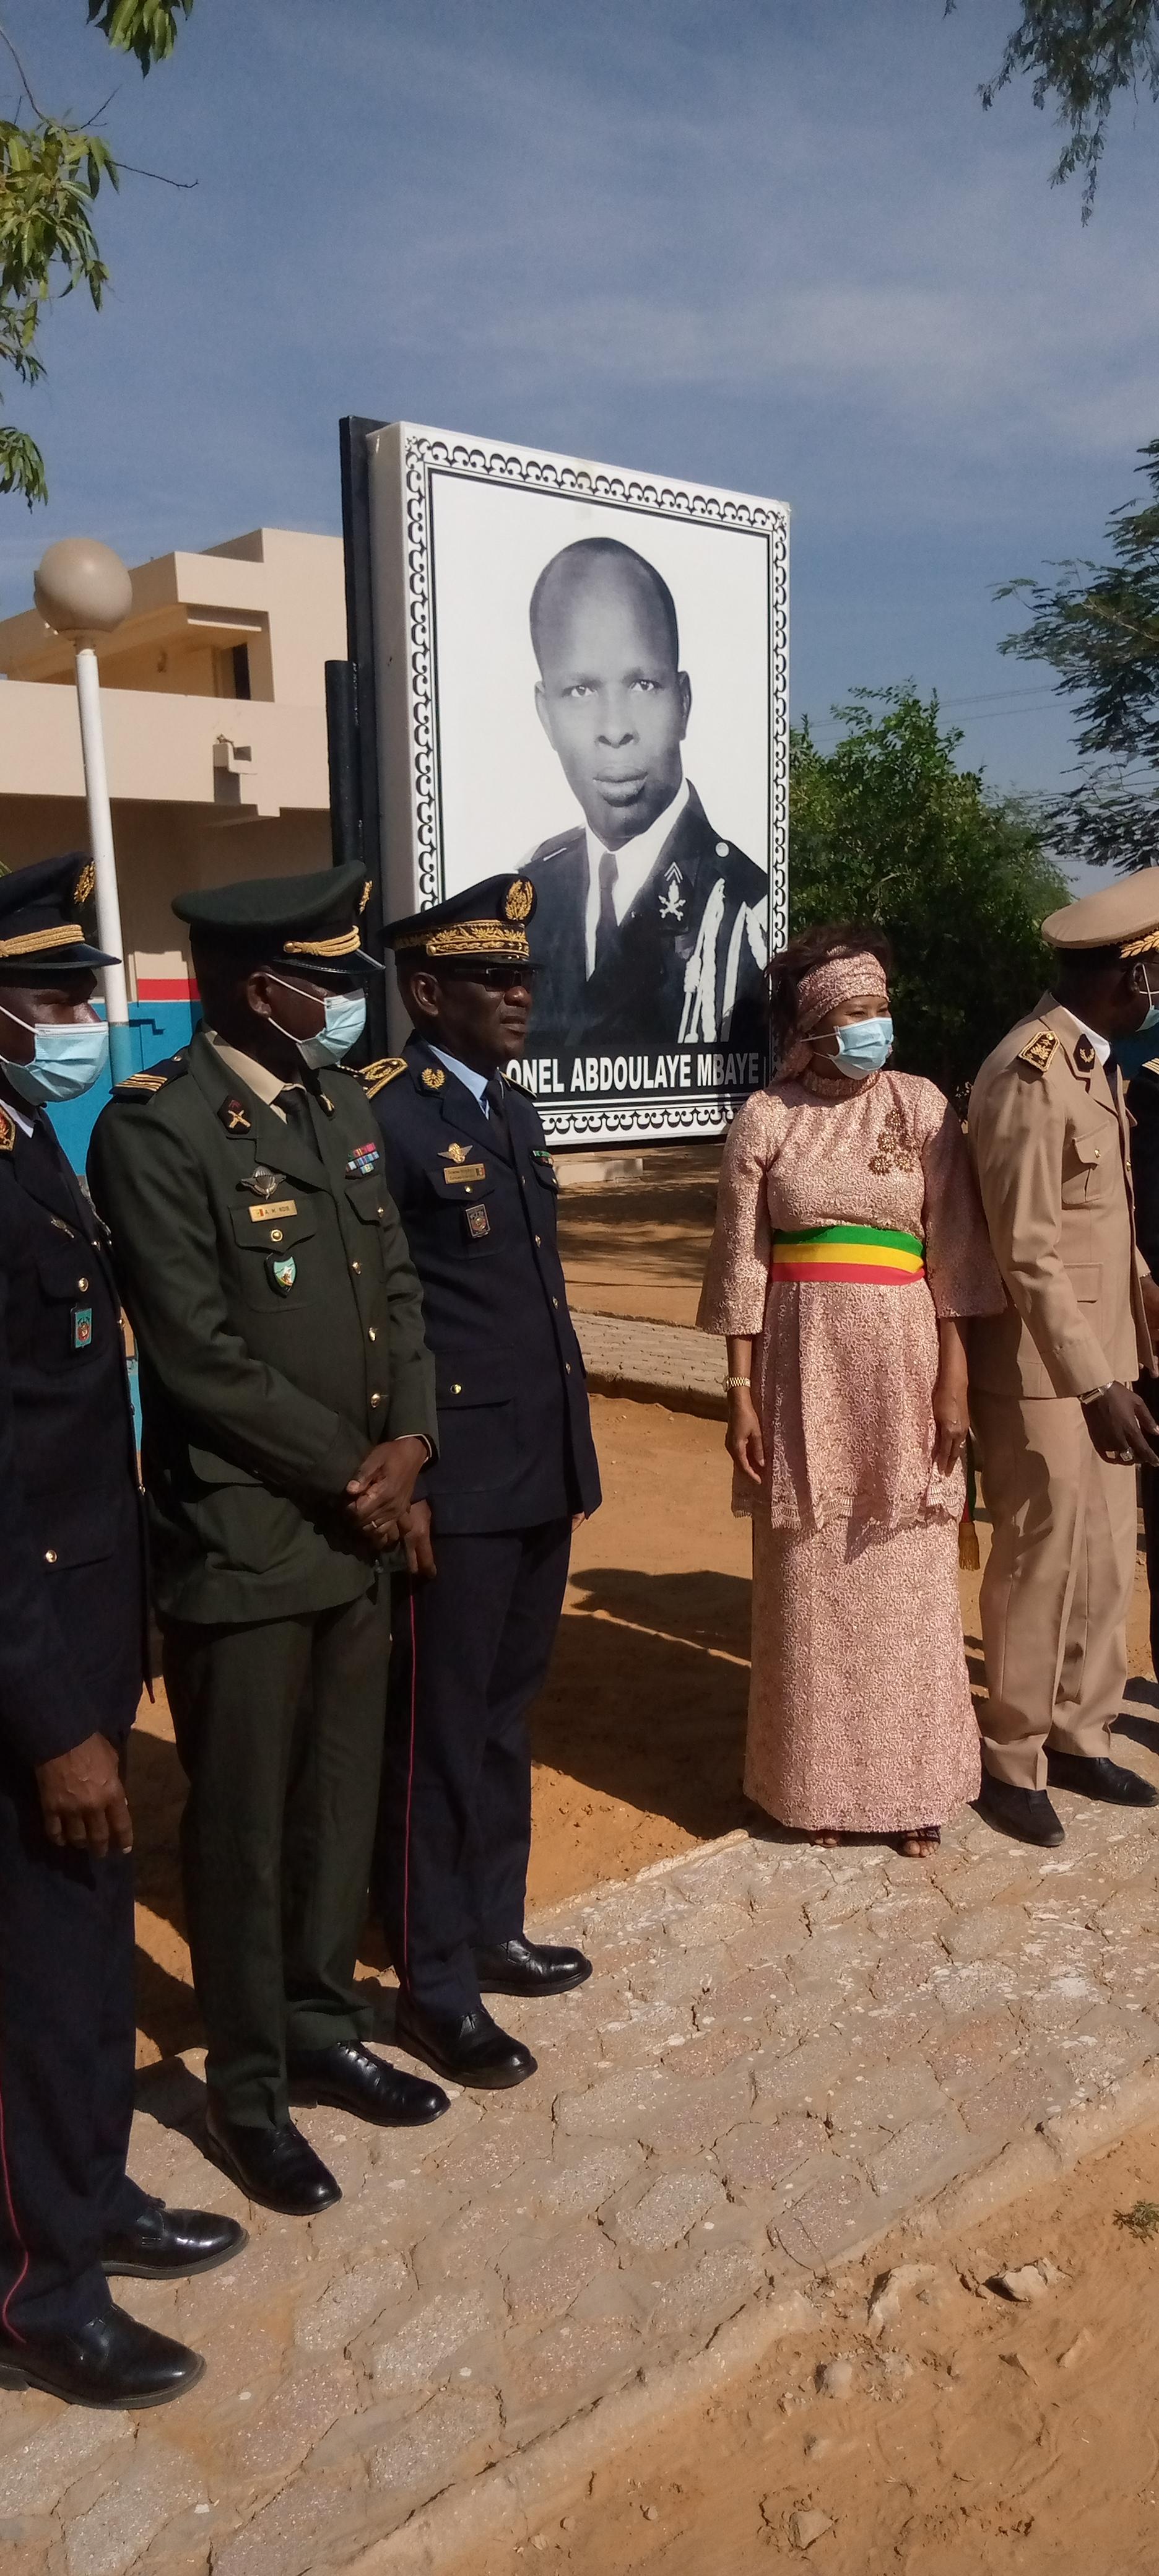 Podor : La caserne de la 53e compagnie baptisée au nom de feu Colonel Abdoulaye Mbaye.